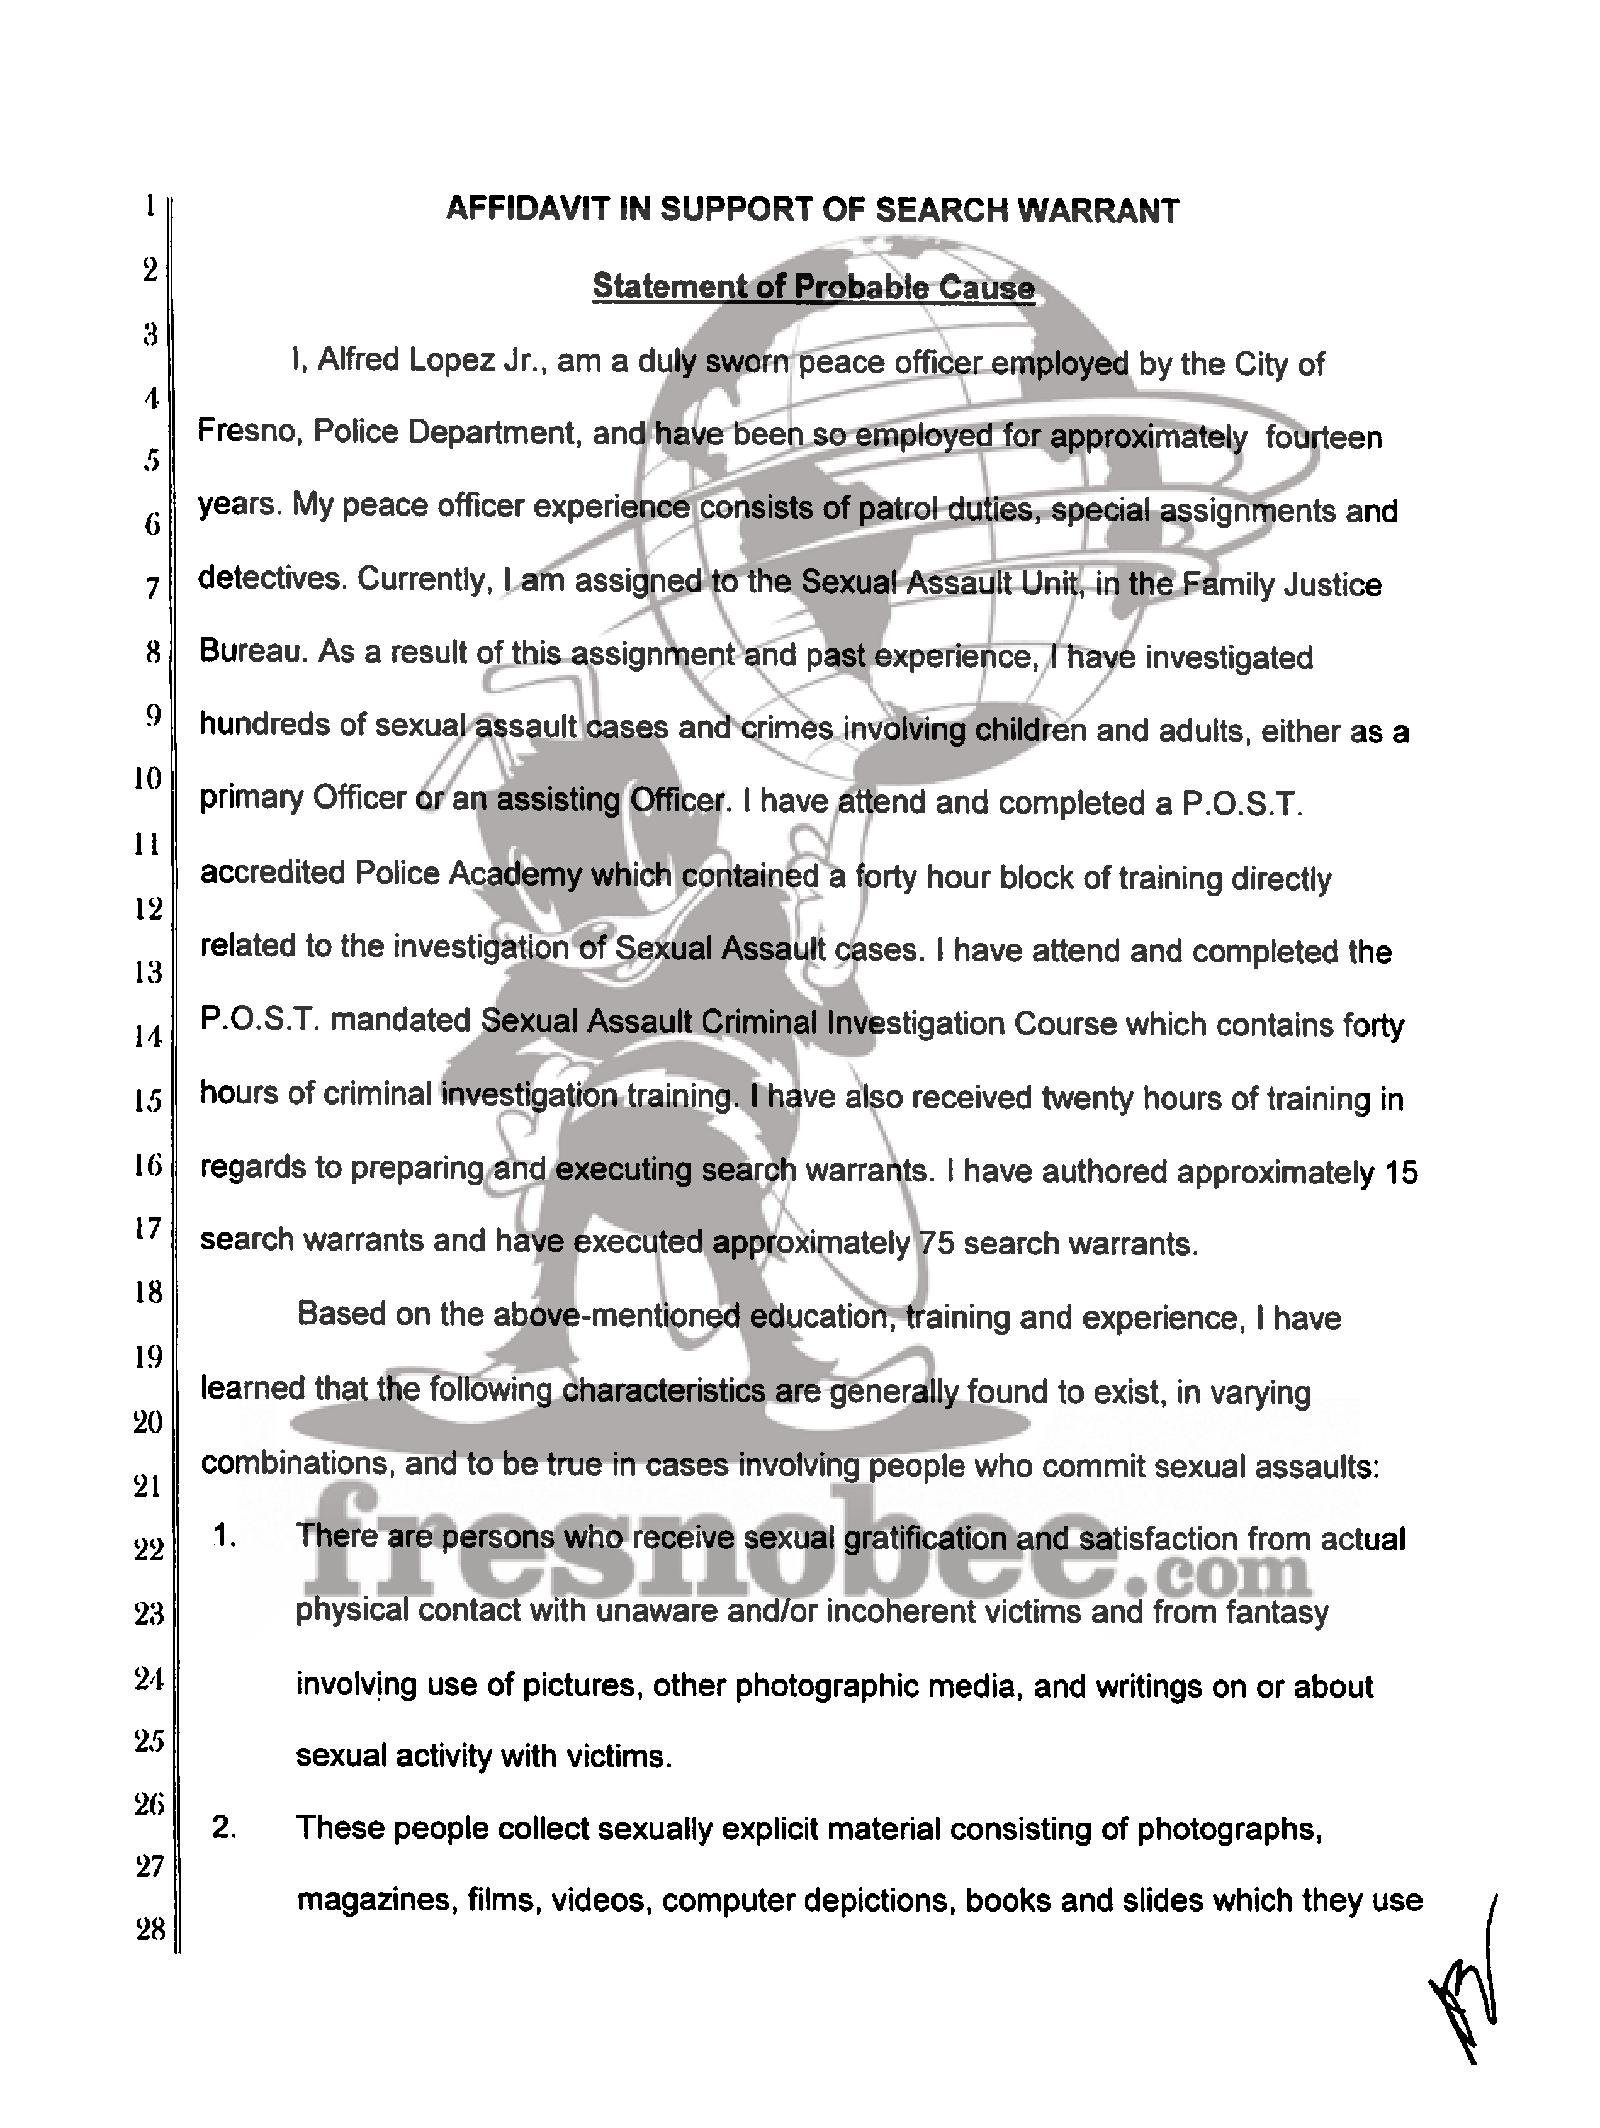 Copy of denman megan search warrant affidavit2.png